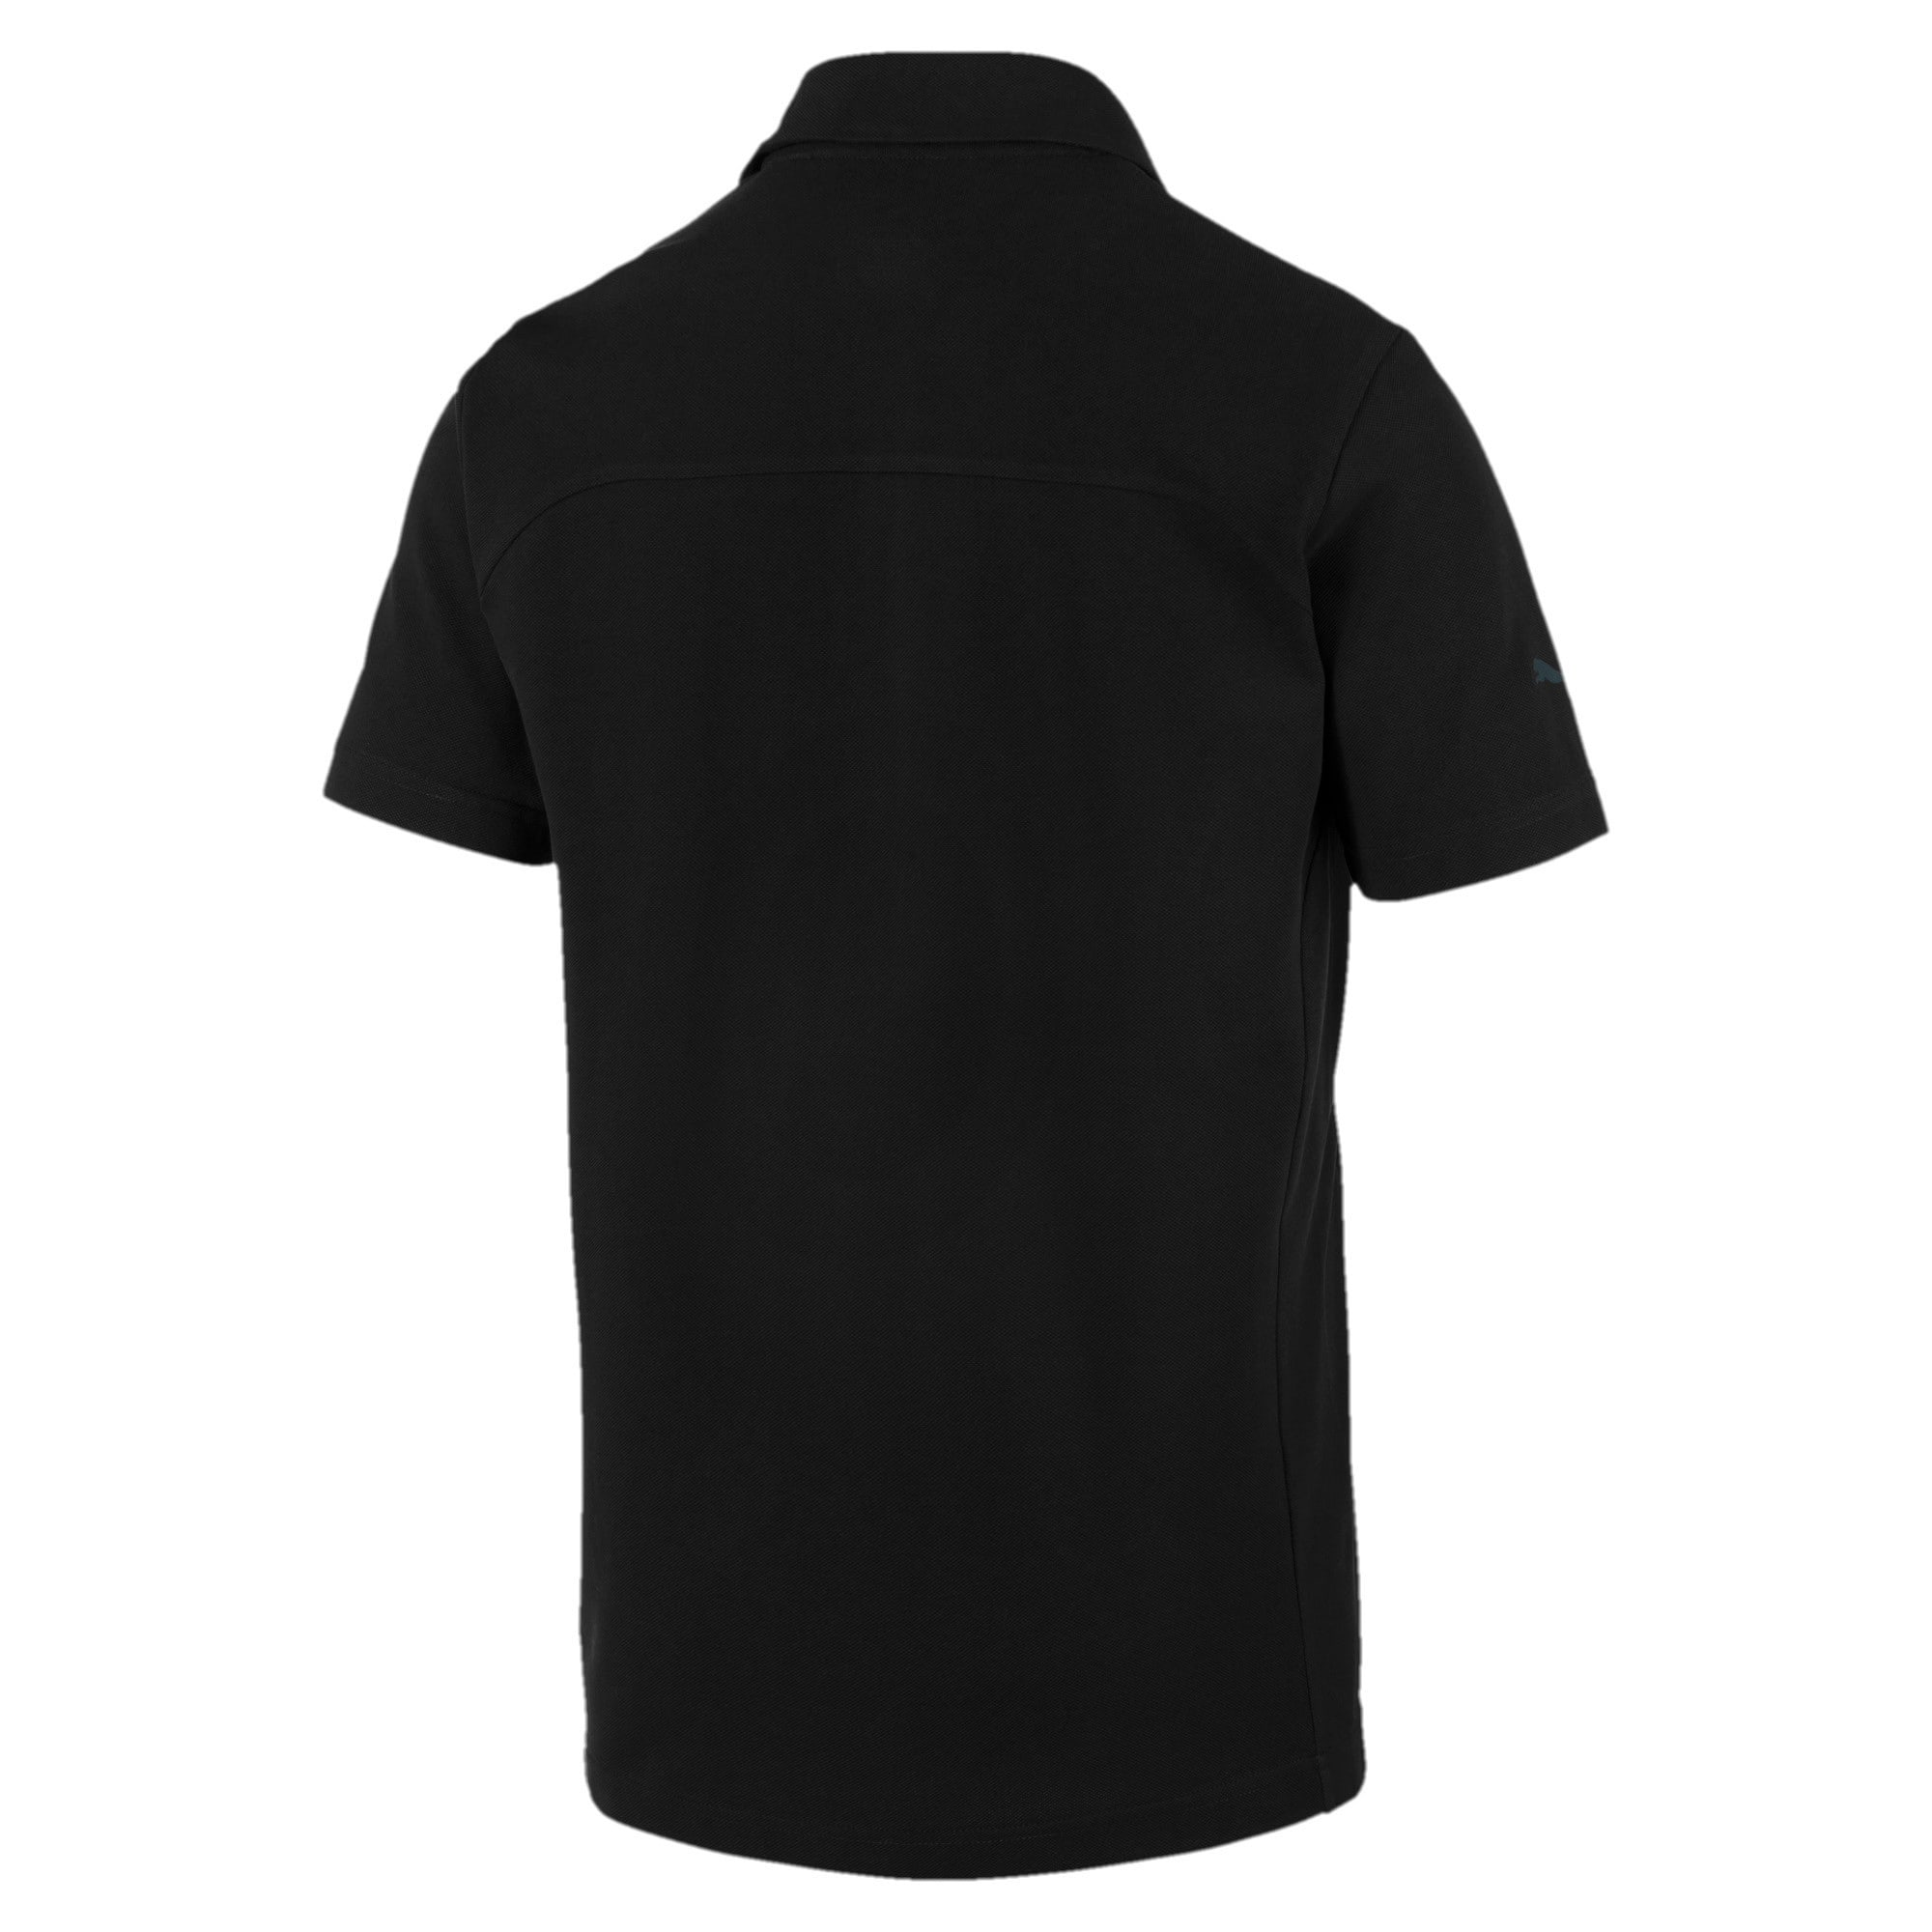 Thumbnail 2 of Ferrari Men's Polo Shirt, Puma Black, medium-IND